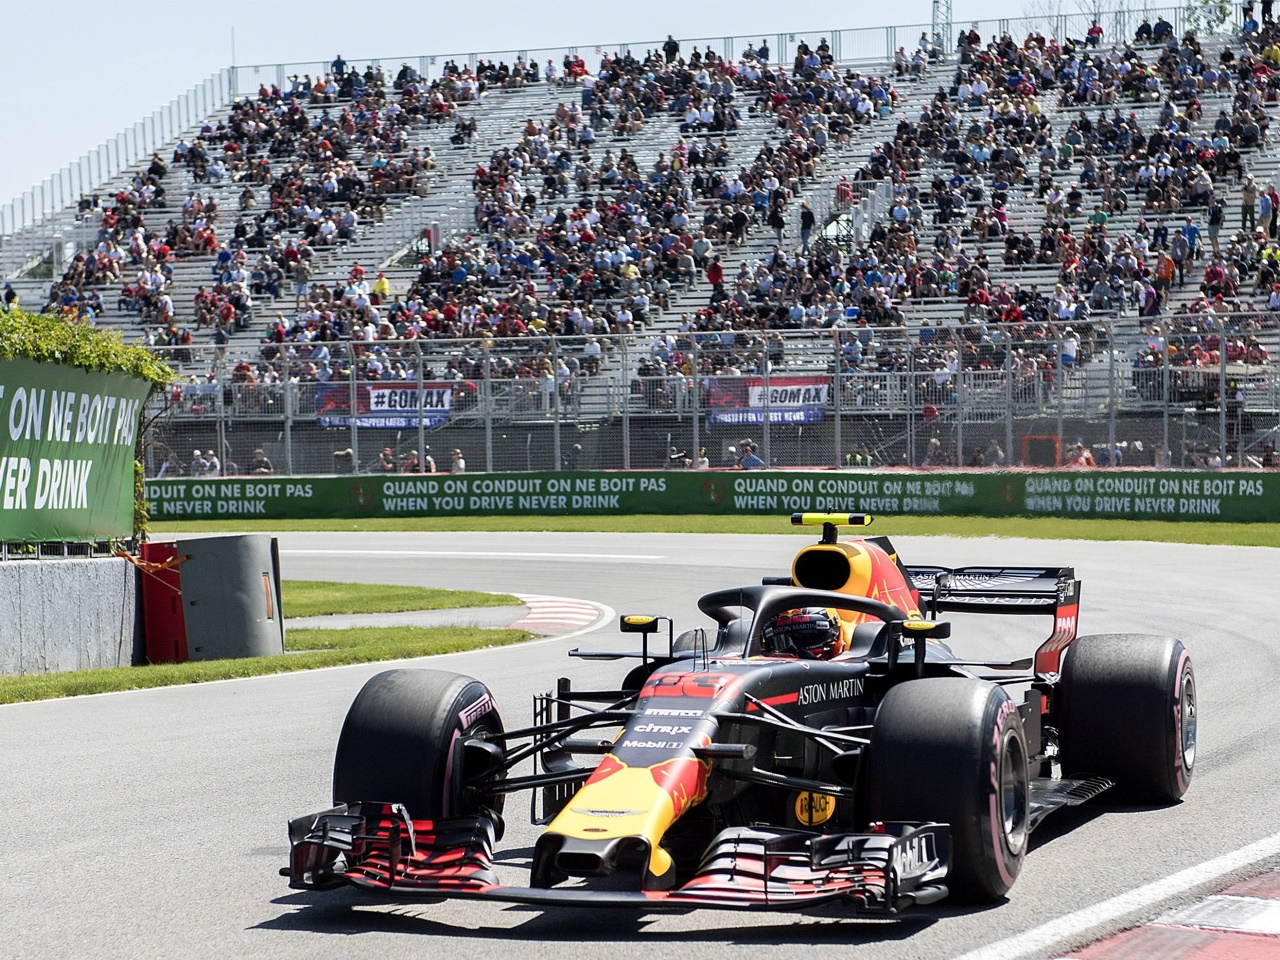 Formel 1: Red Bull ab 2019 mit neuem Motorlieferanten